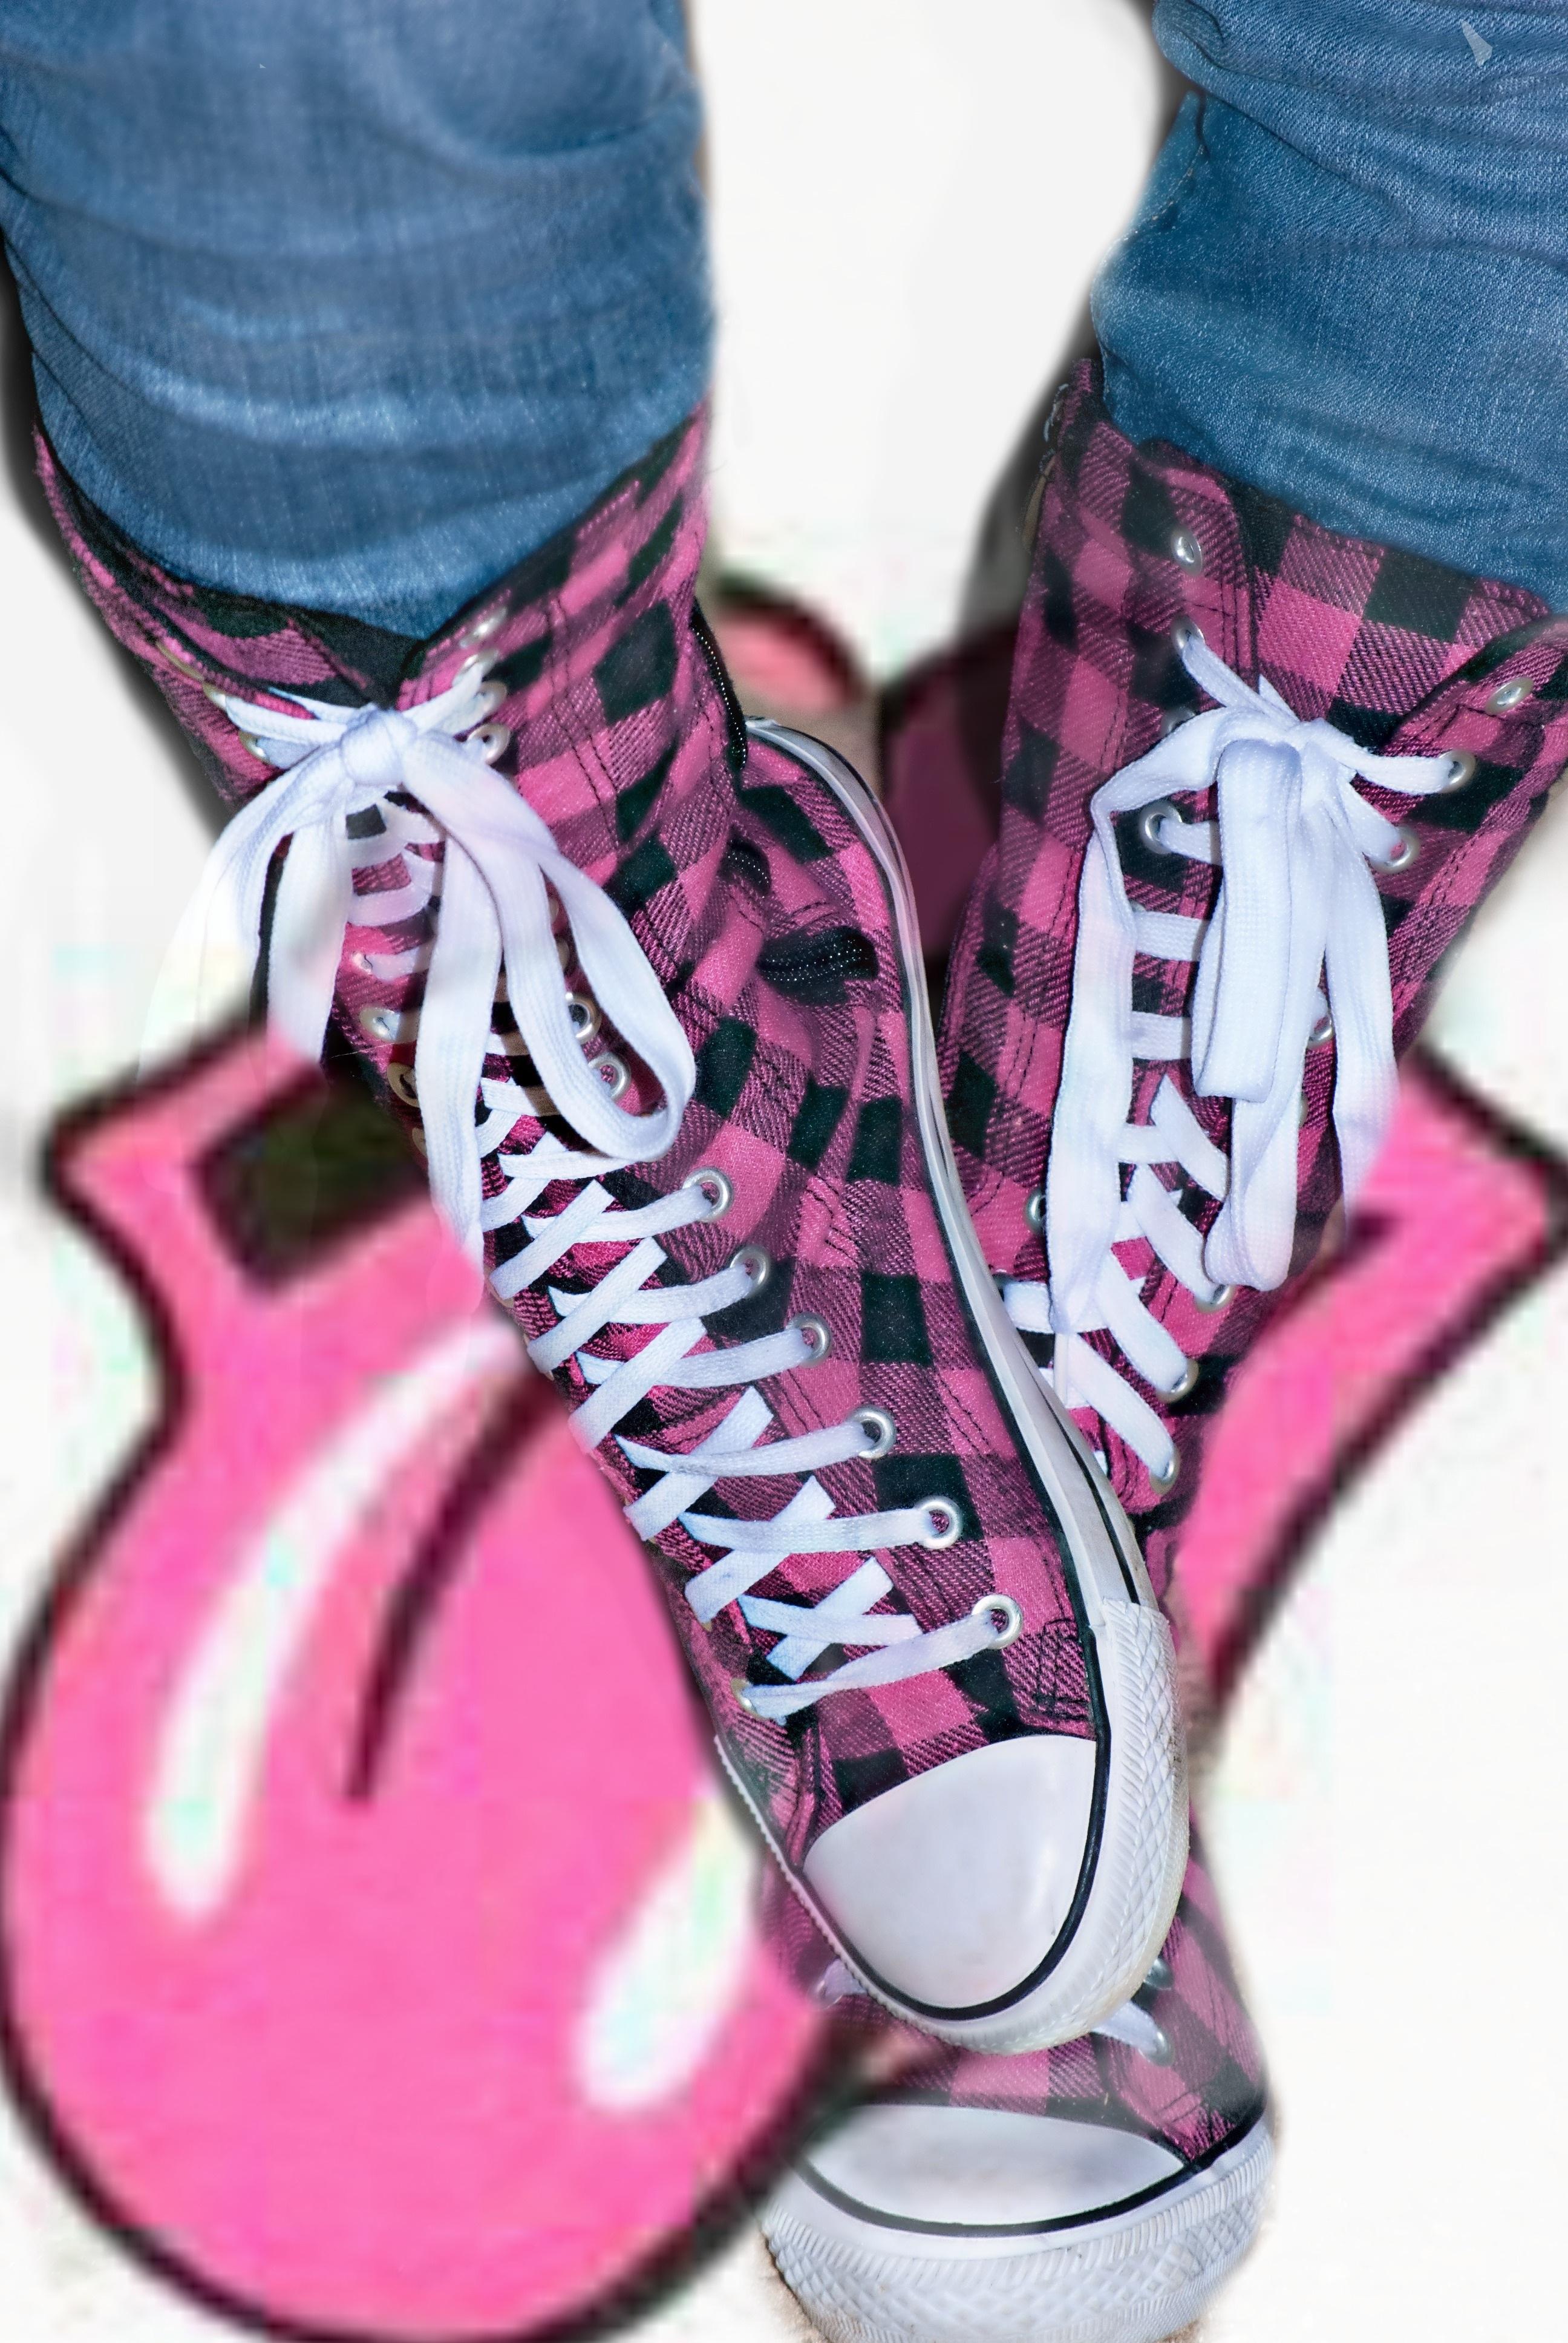 Kostenlose foto : Schuh, Frau, lila, Bein, Muster, Frühling